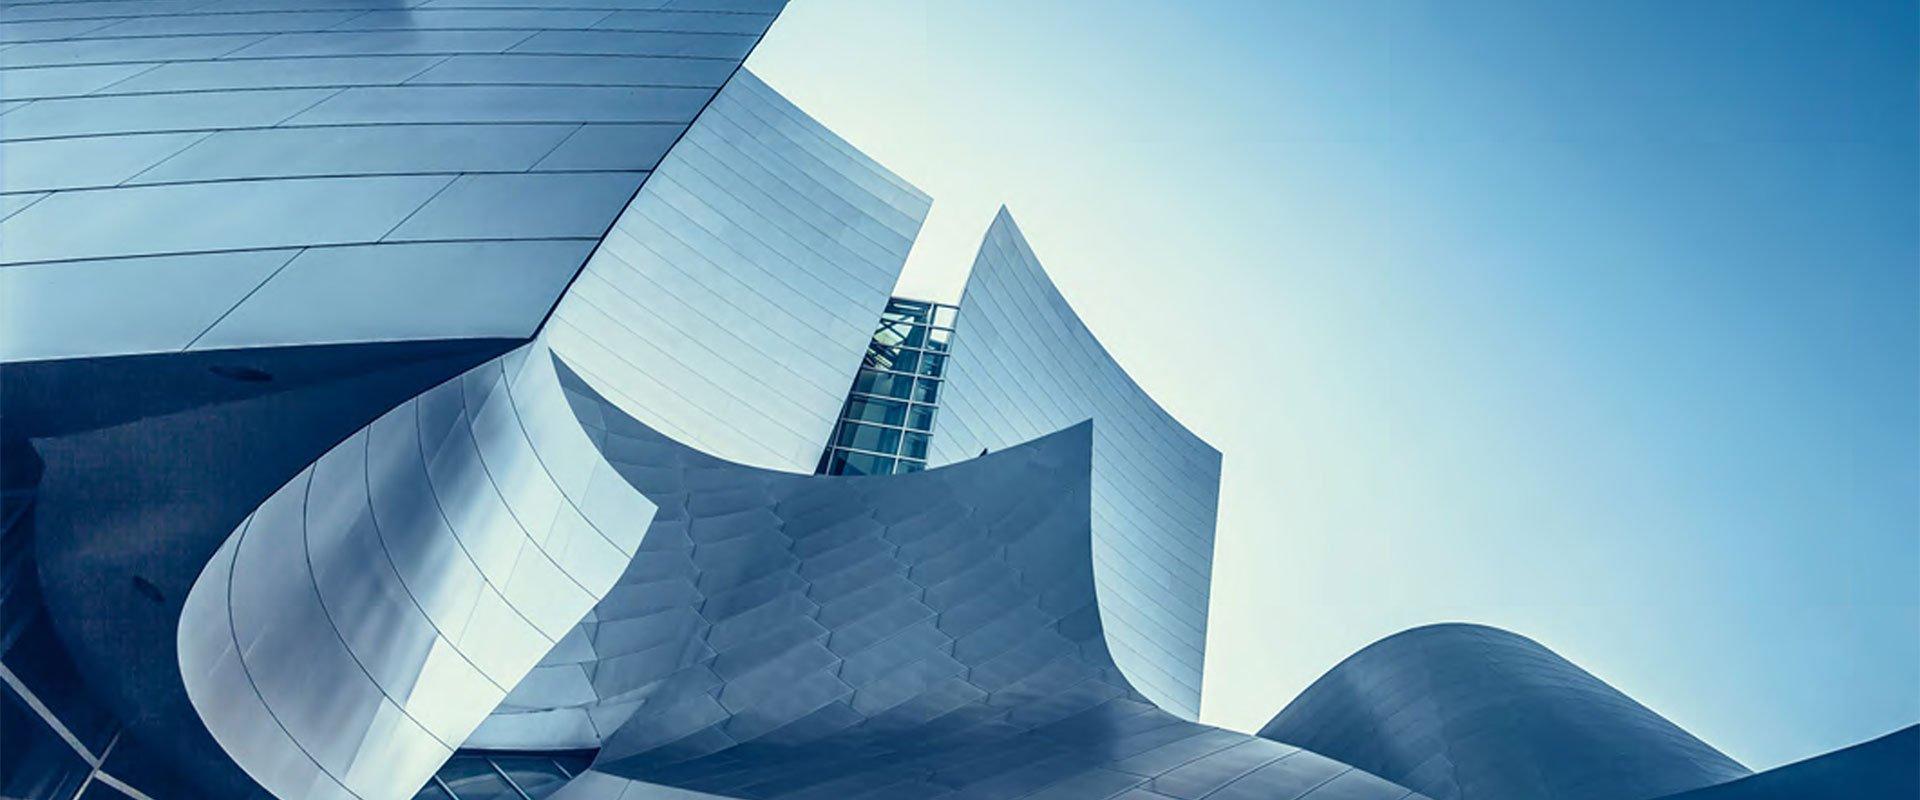 Agile Verwaltung – so geht's mit OPTIMAL SYSTEMS